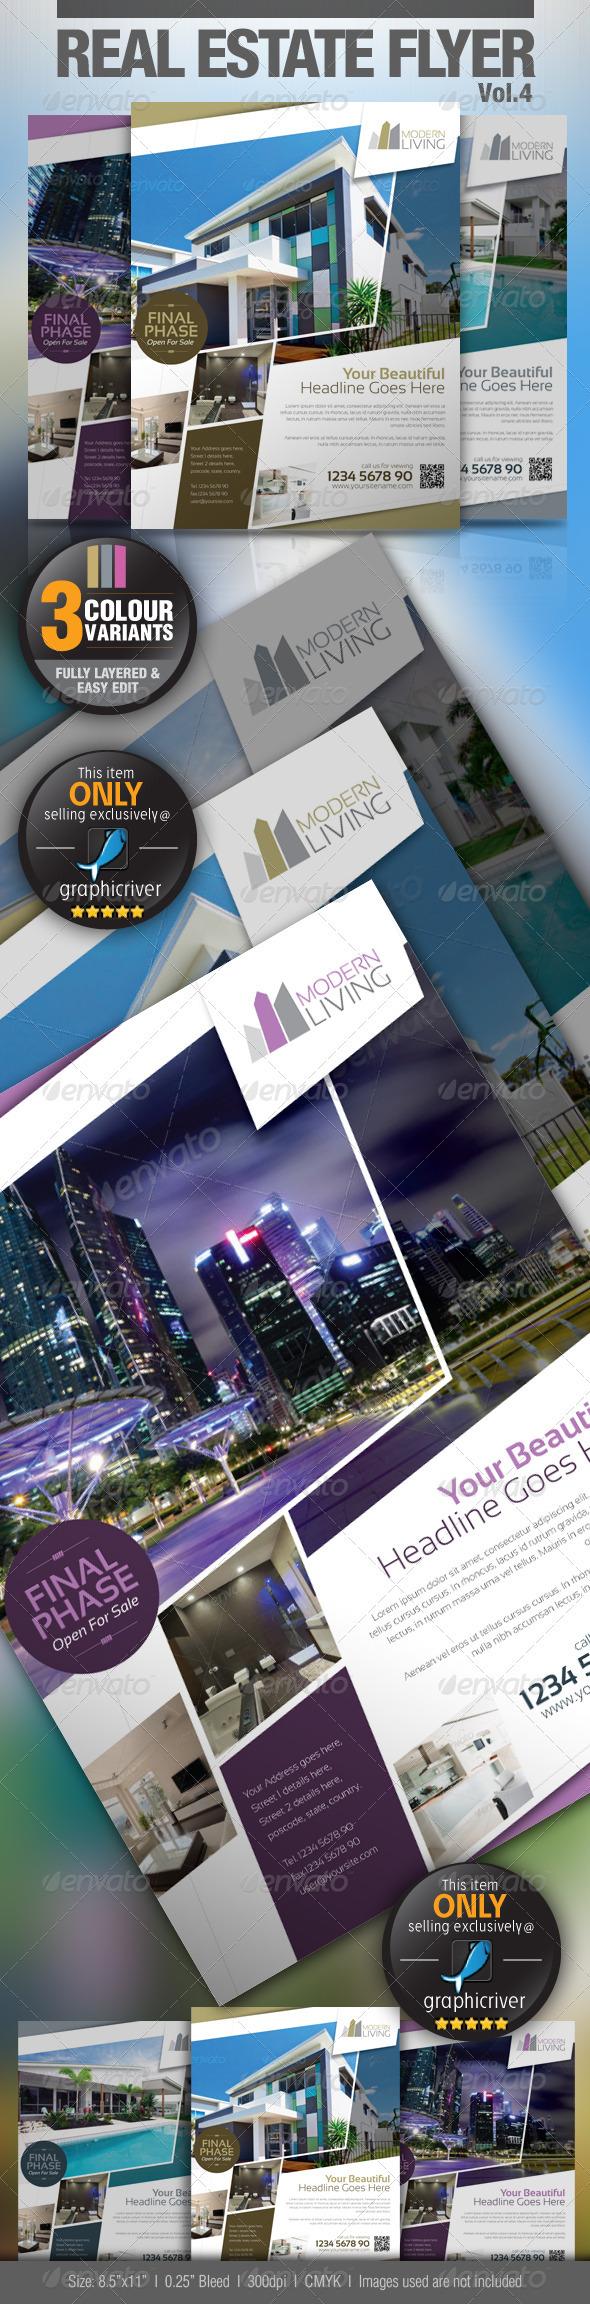 GraphicRiver Real Estate Flyer Vol.4 2879155